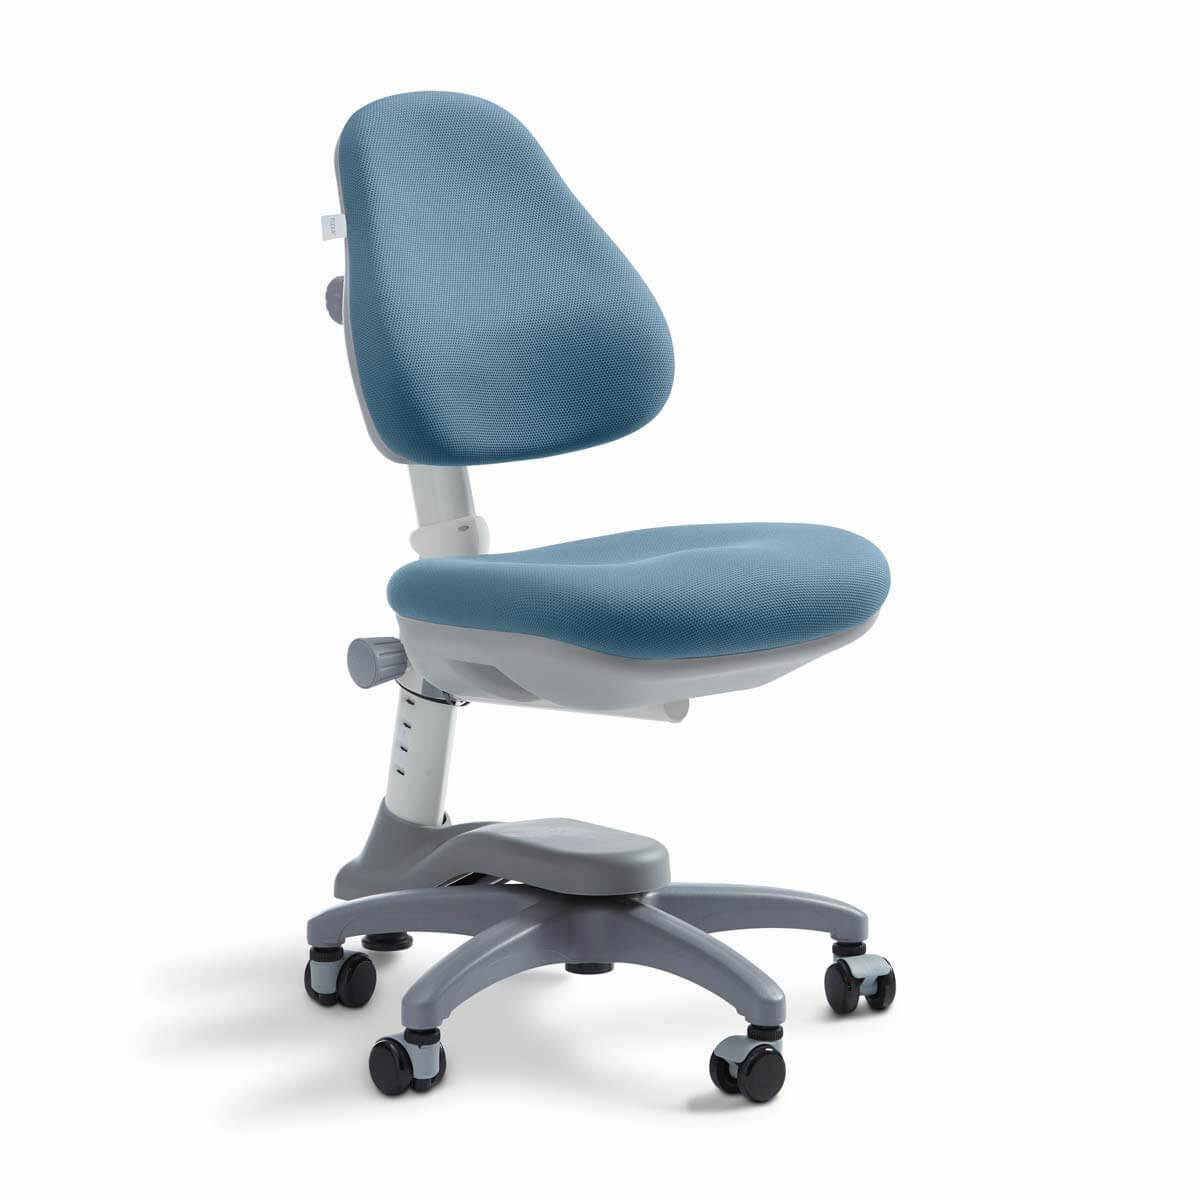 Silla de oficina infantil 7-12Y STUDY NOVO Flexa azul claro